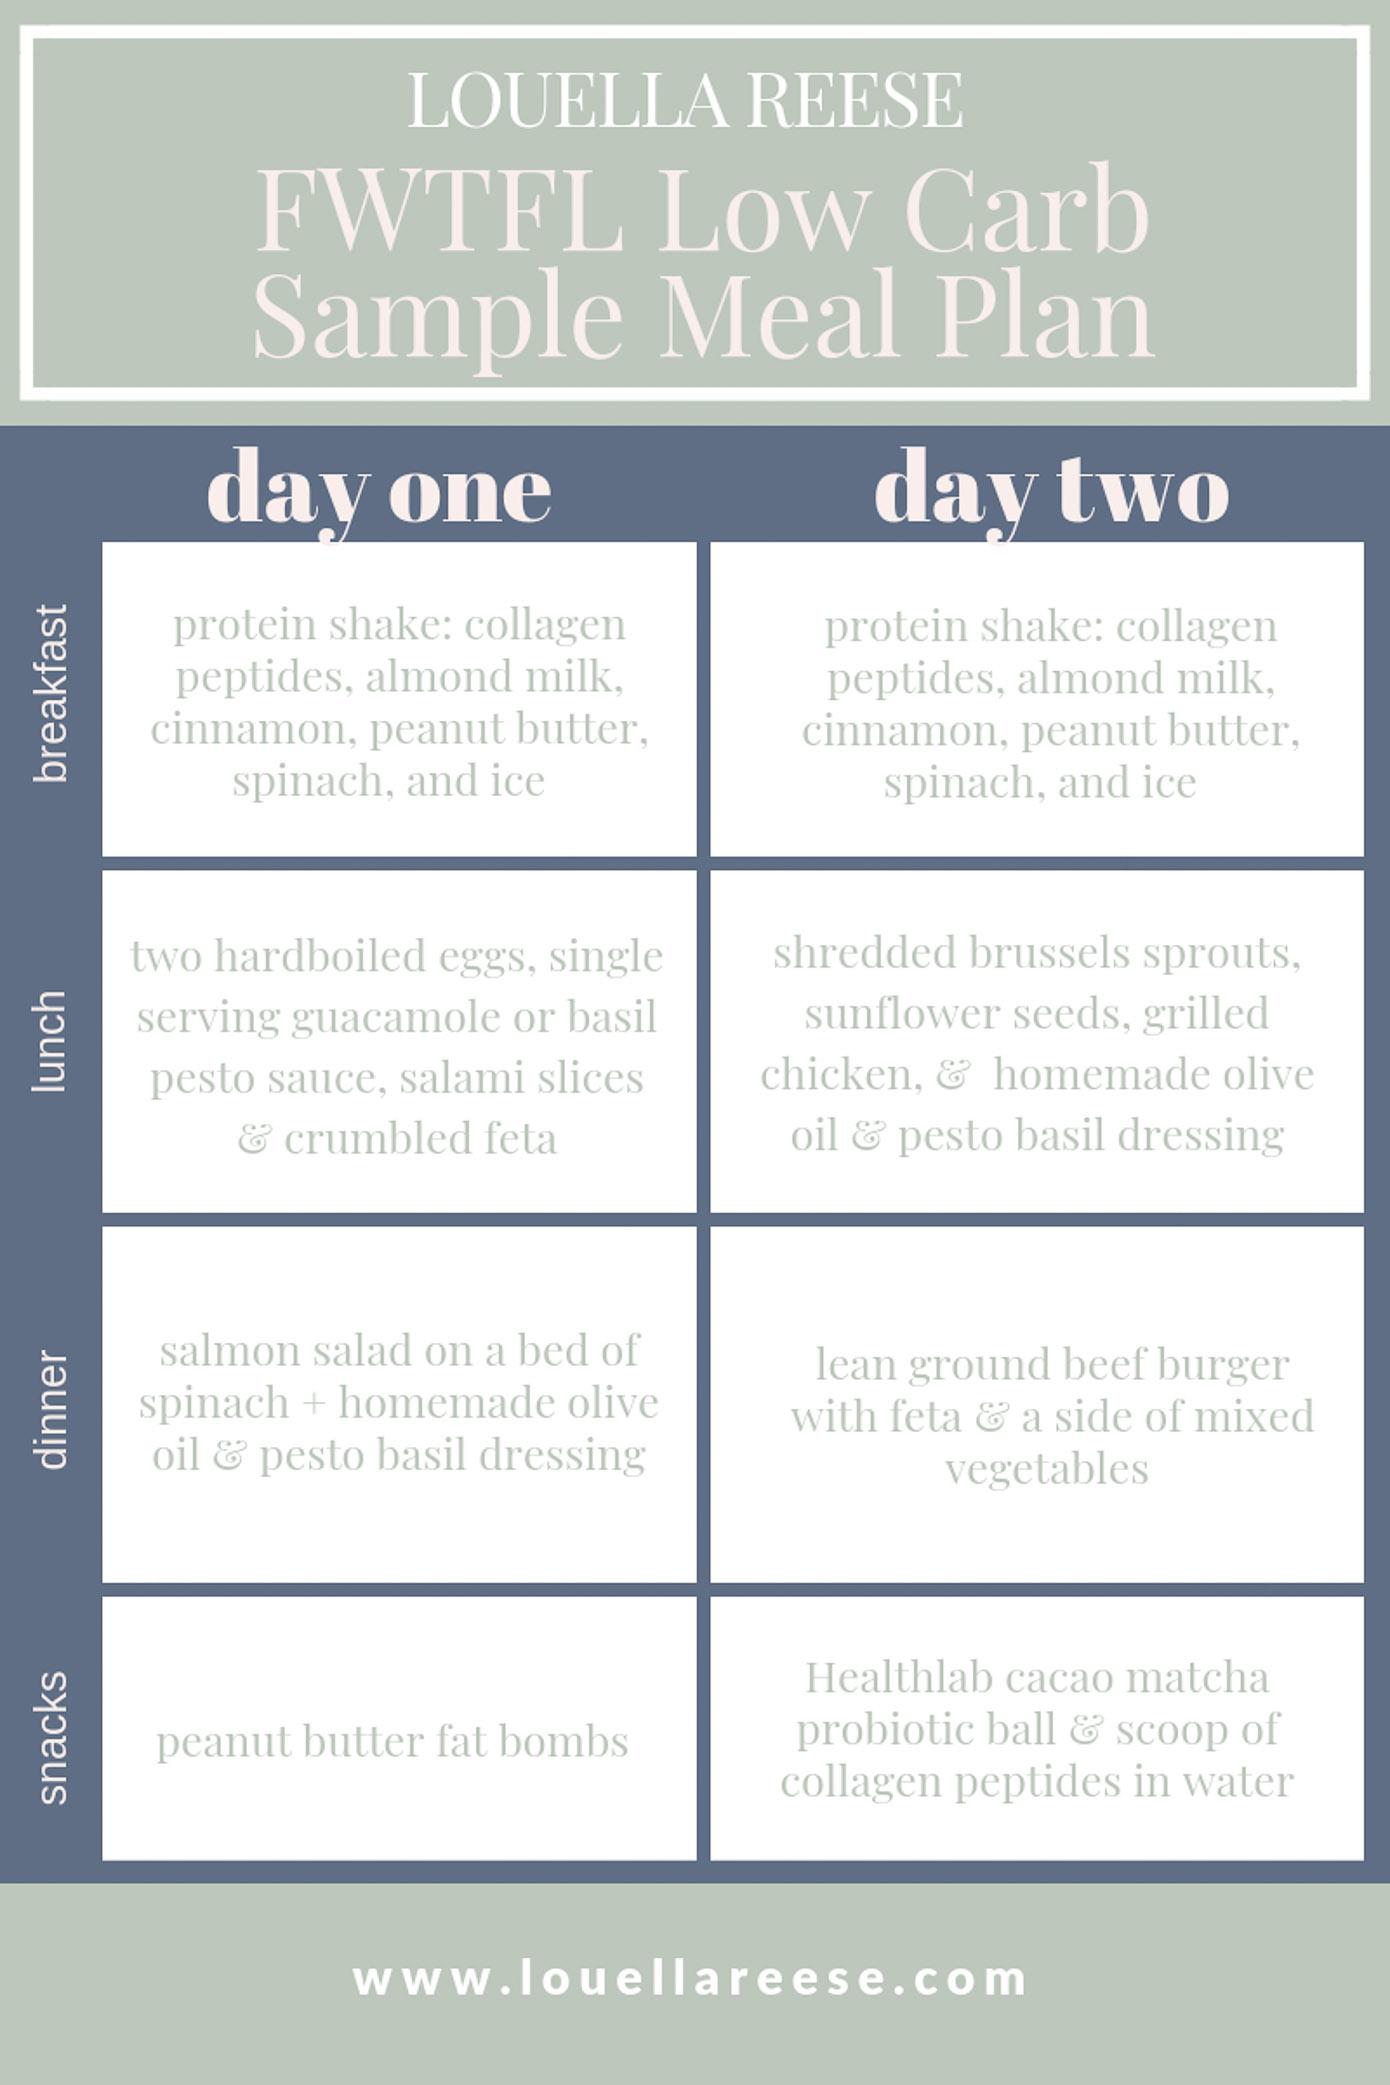 1 Week Low Carb Meal Plan